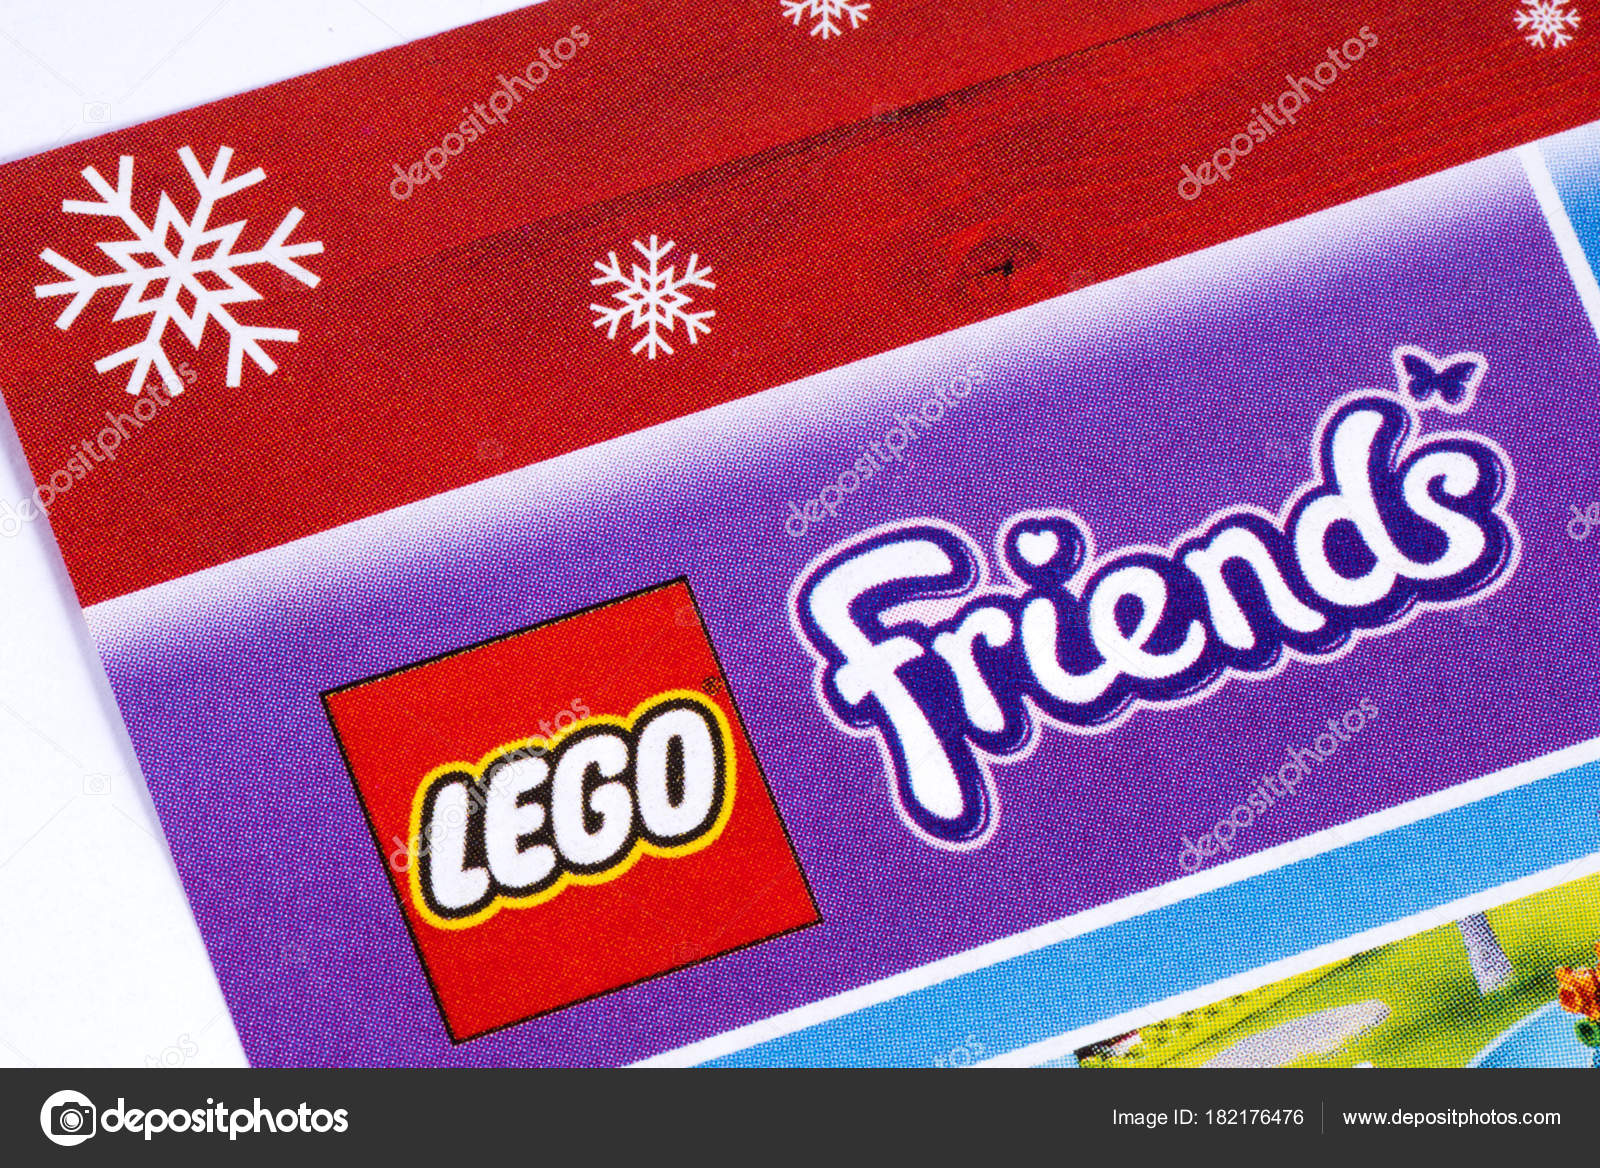 Lego Friends Logo in a Catalogue – Stock Editorial Photo